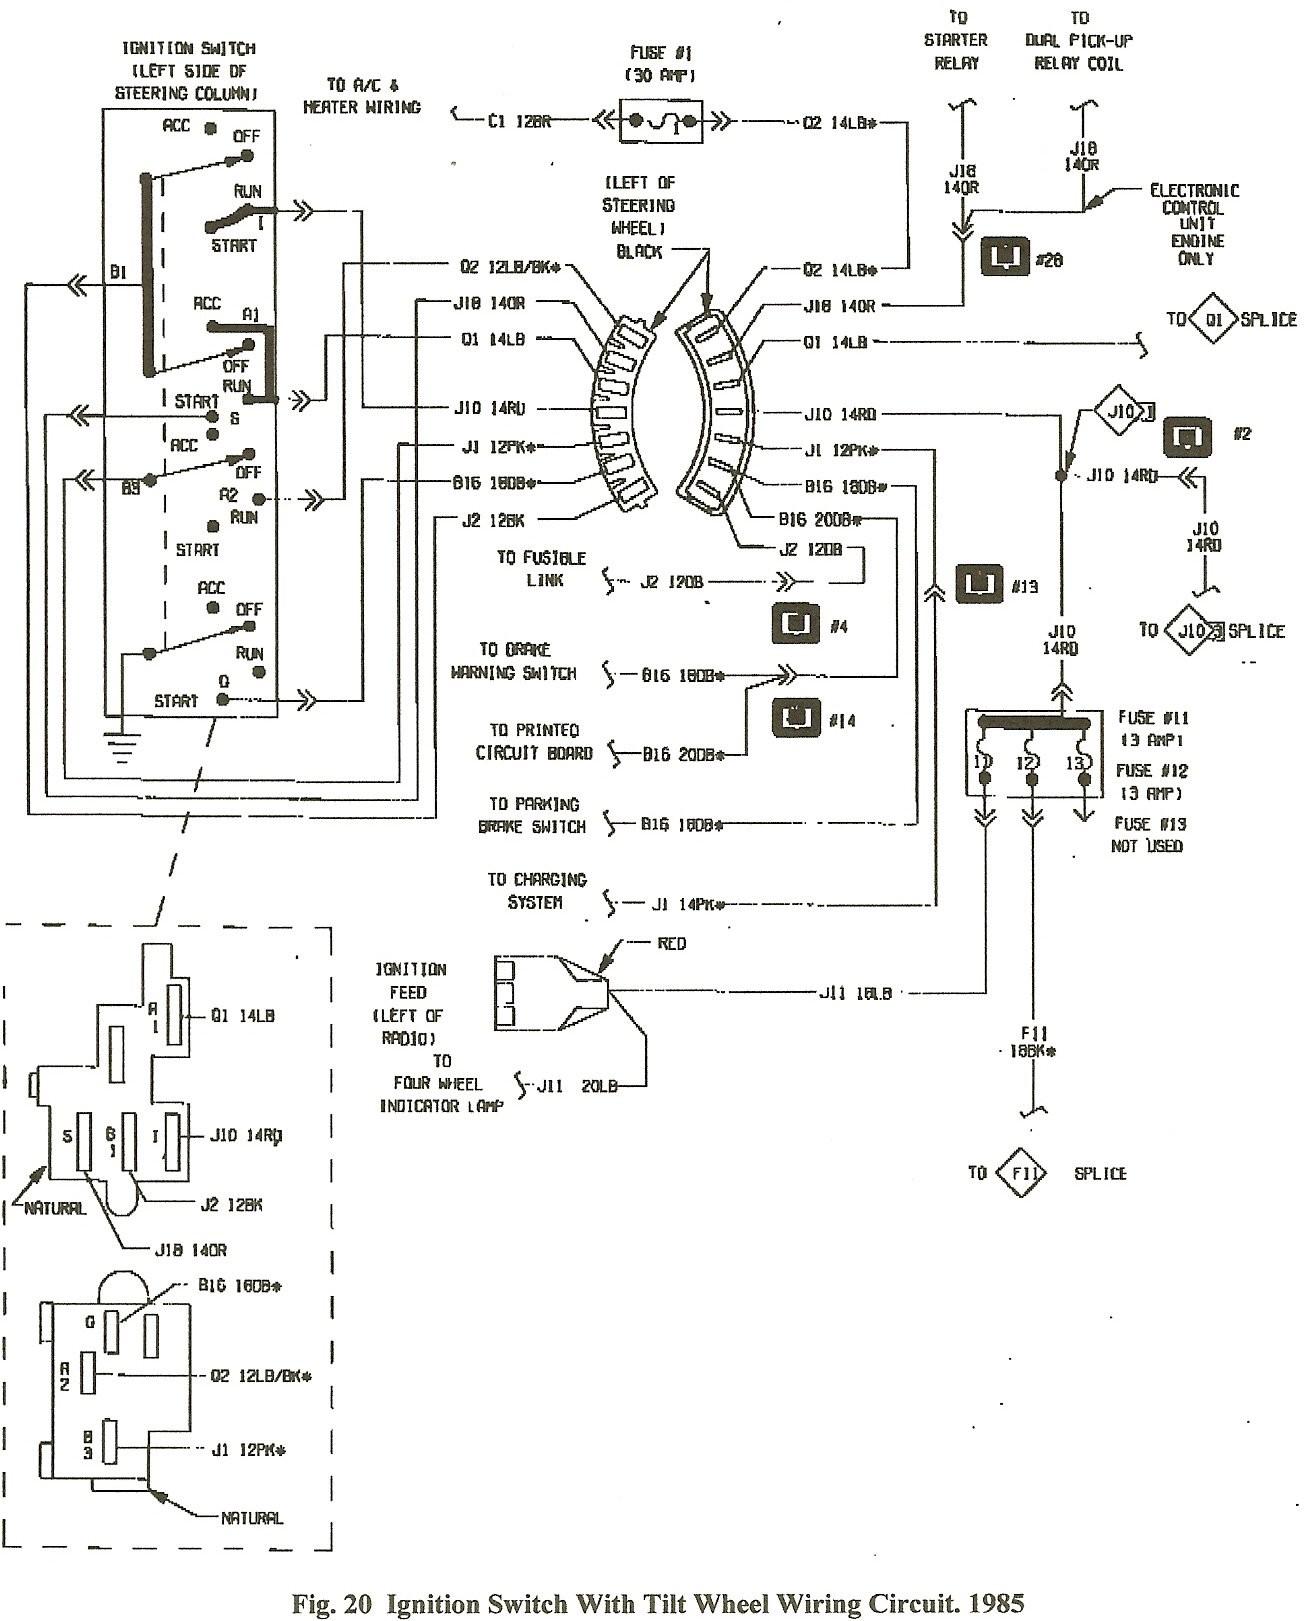 File Name 92 Dakotum Wire Diagram